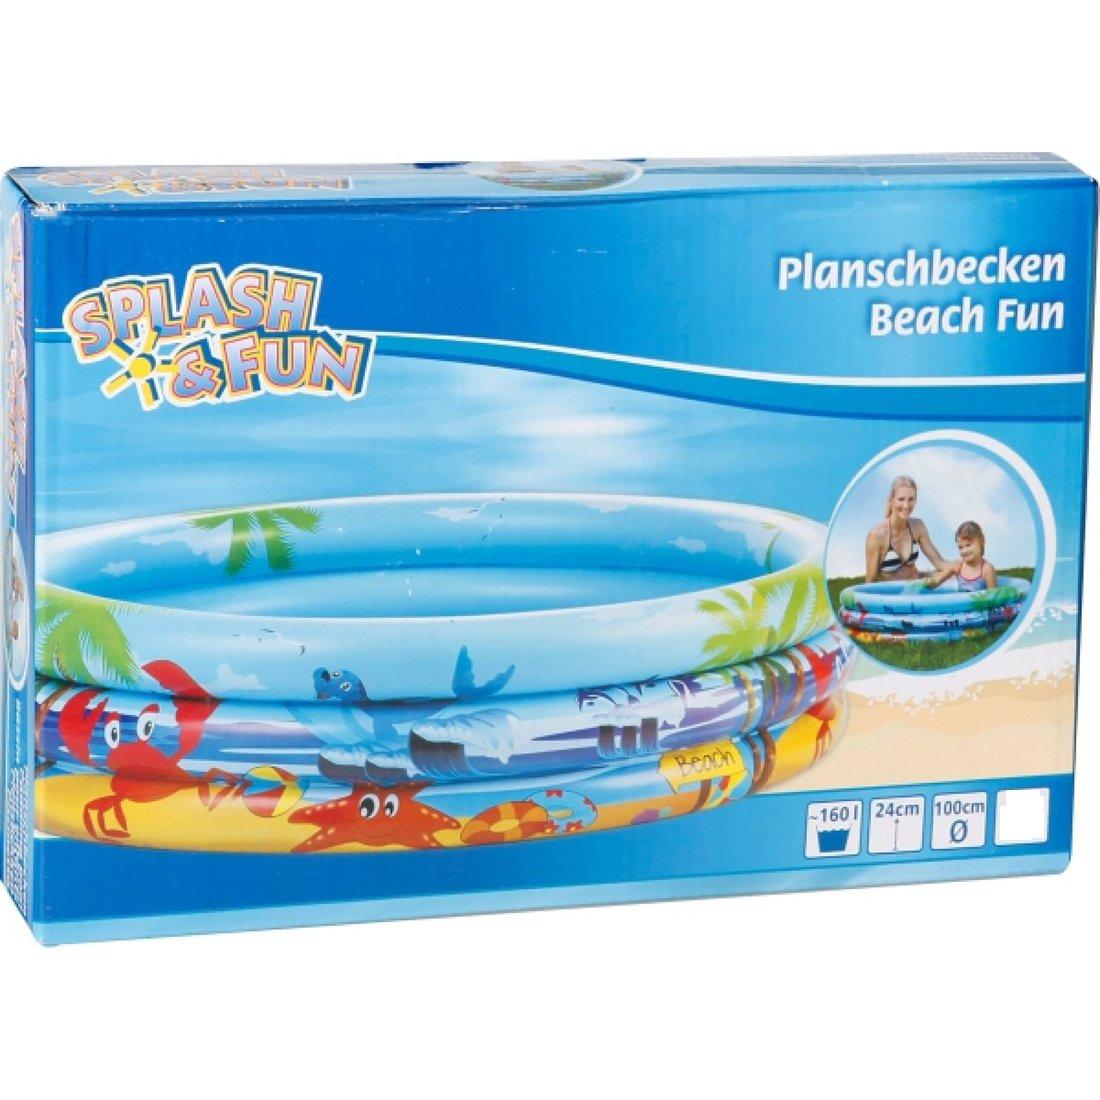 Planschbecken Splash & Fun Beach Fun 100 cm